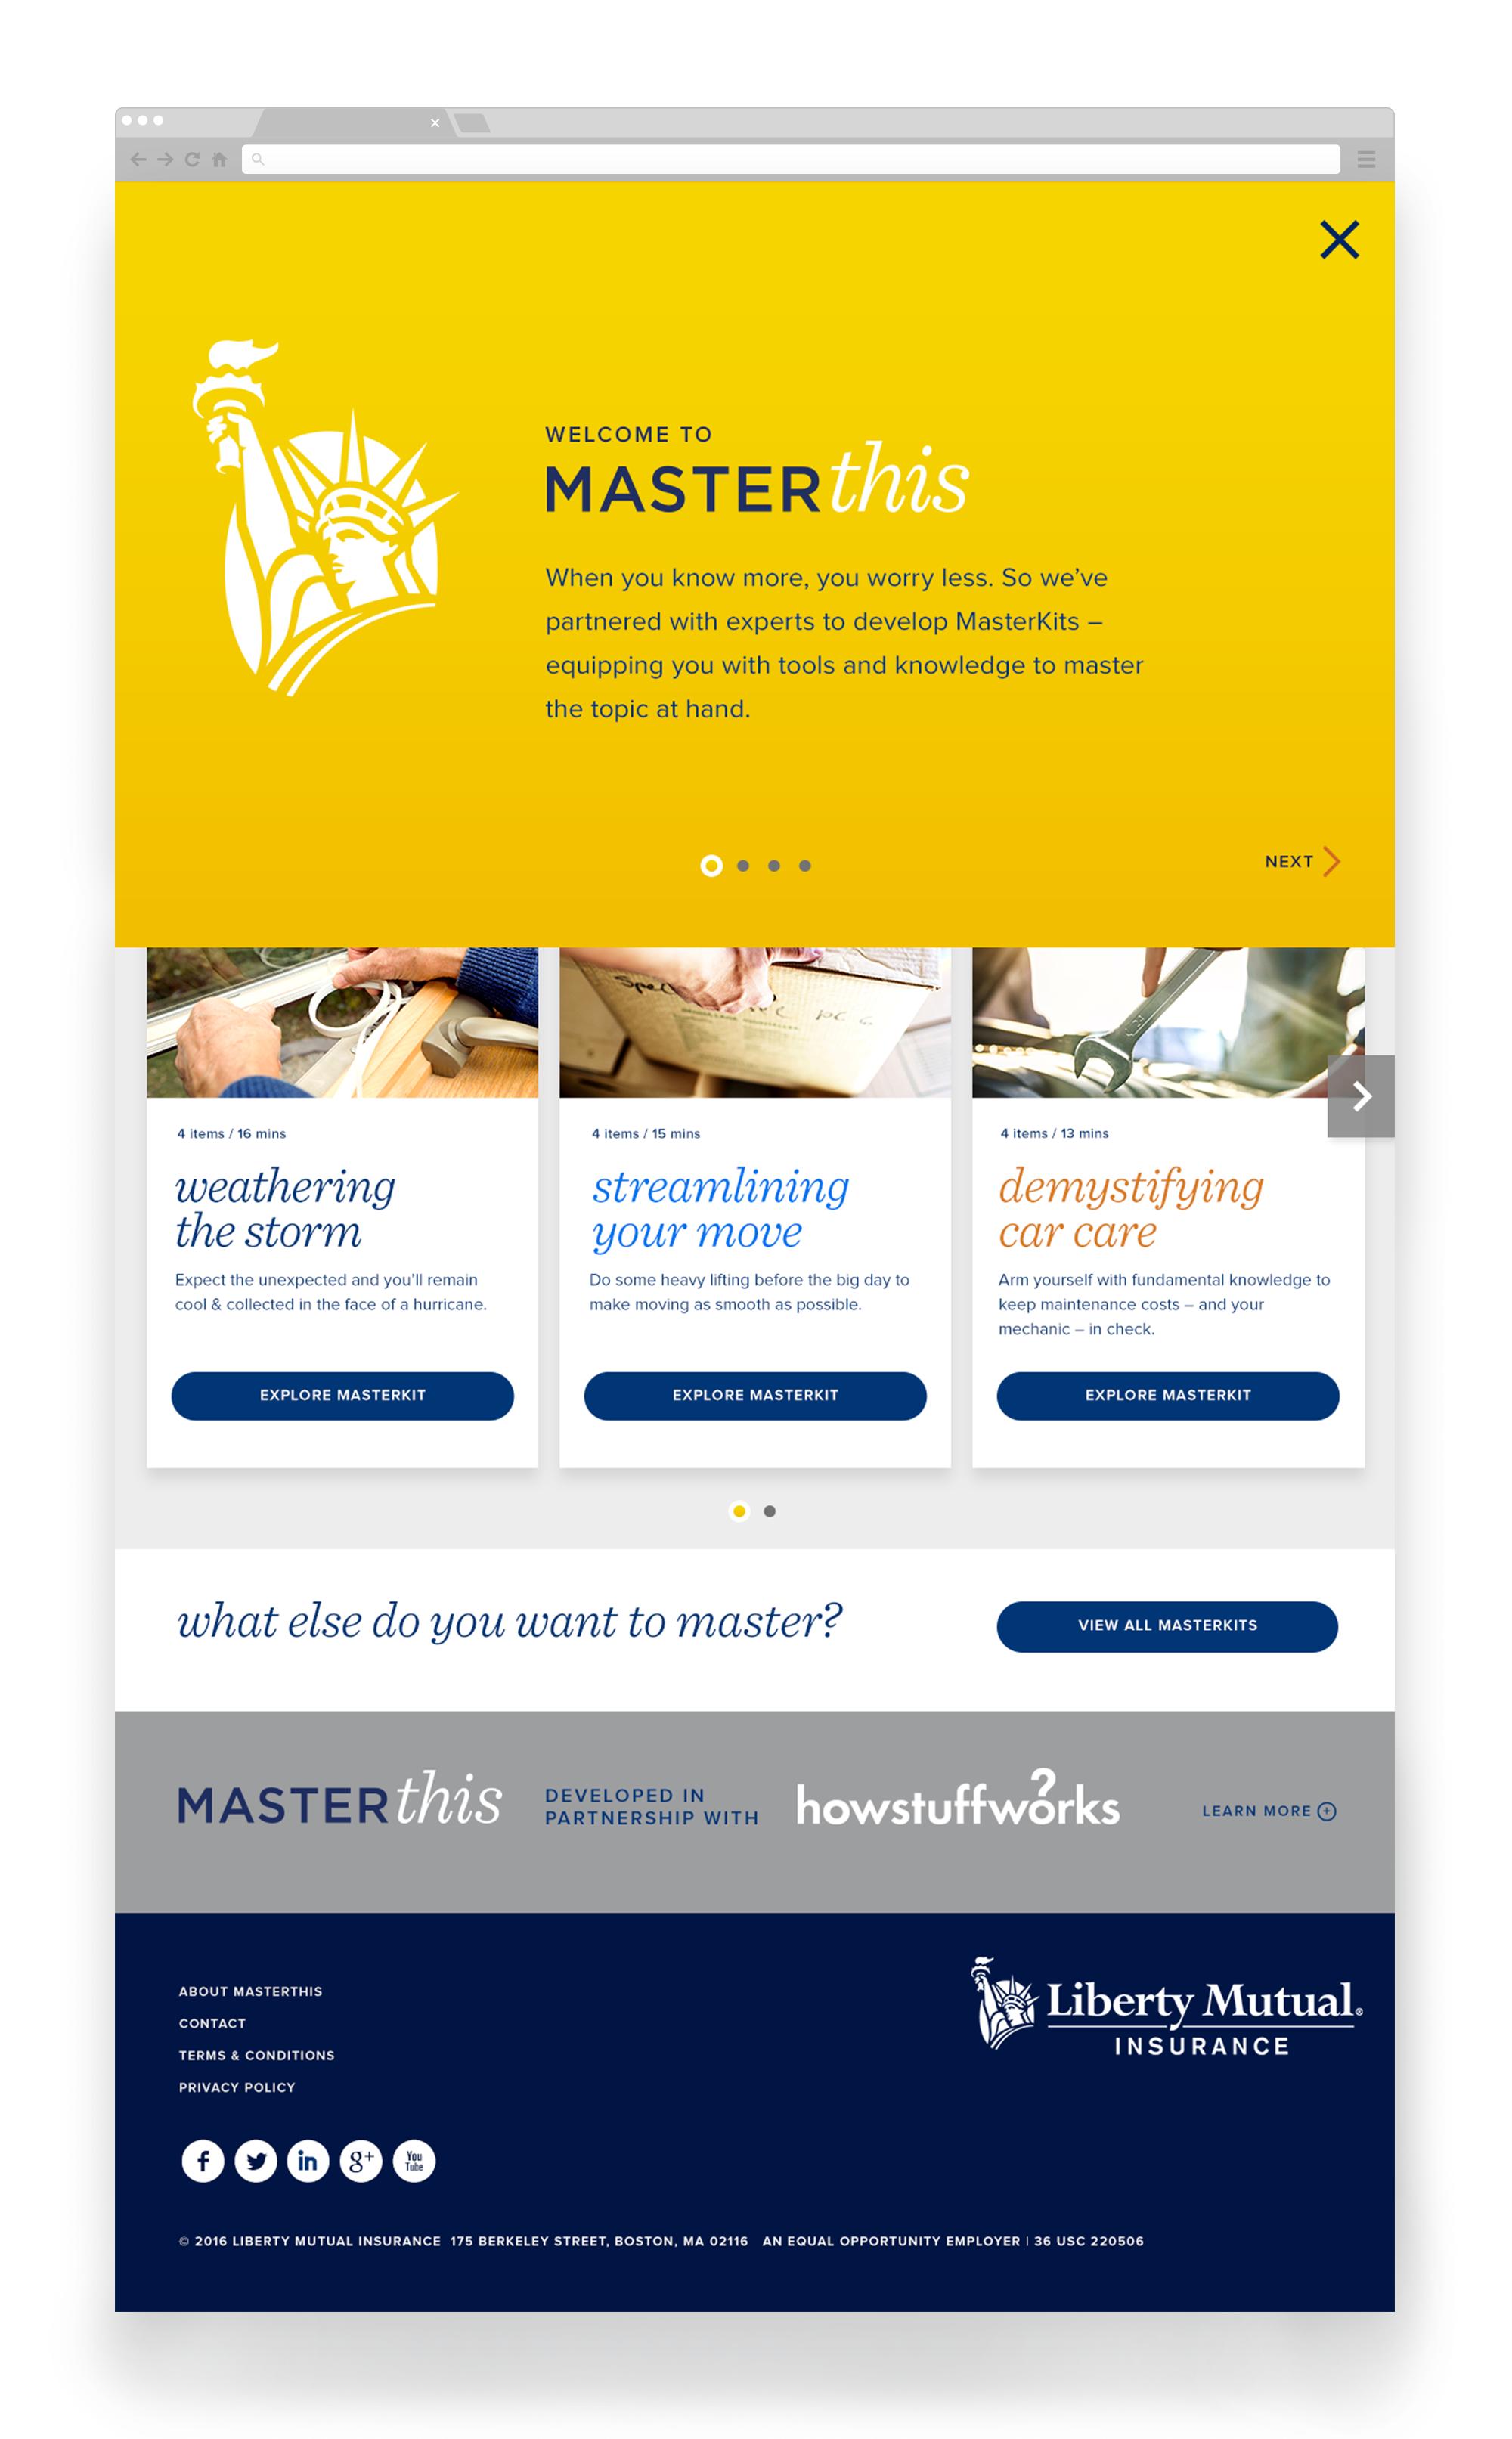 masterthis_mockup_browser_hp1.png